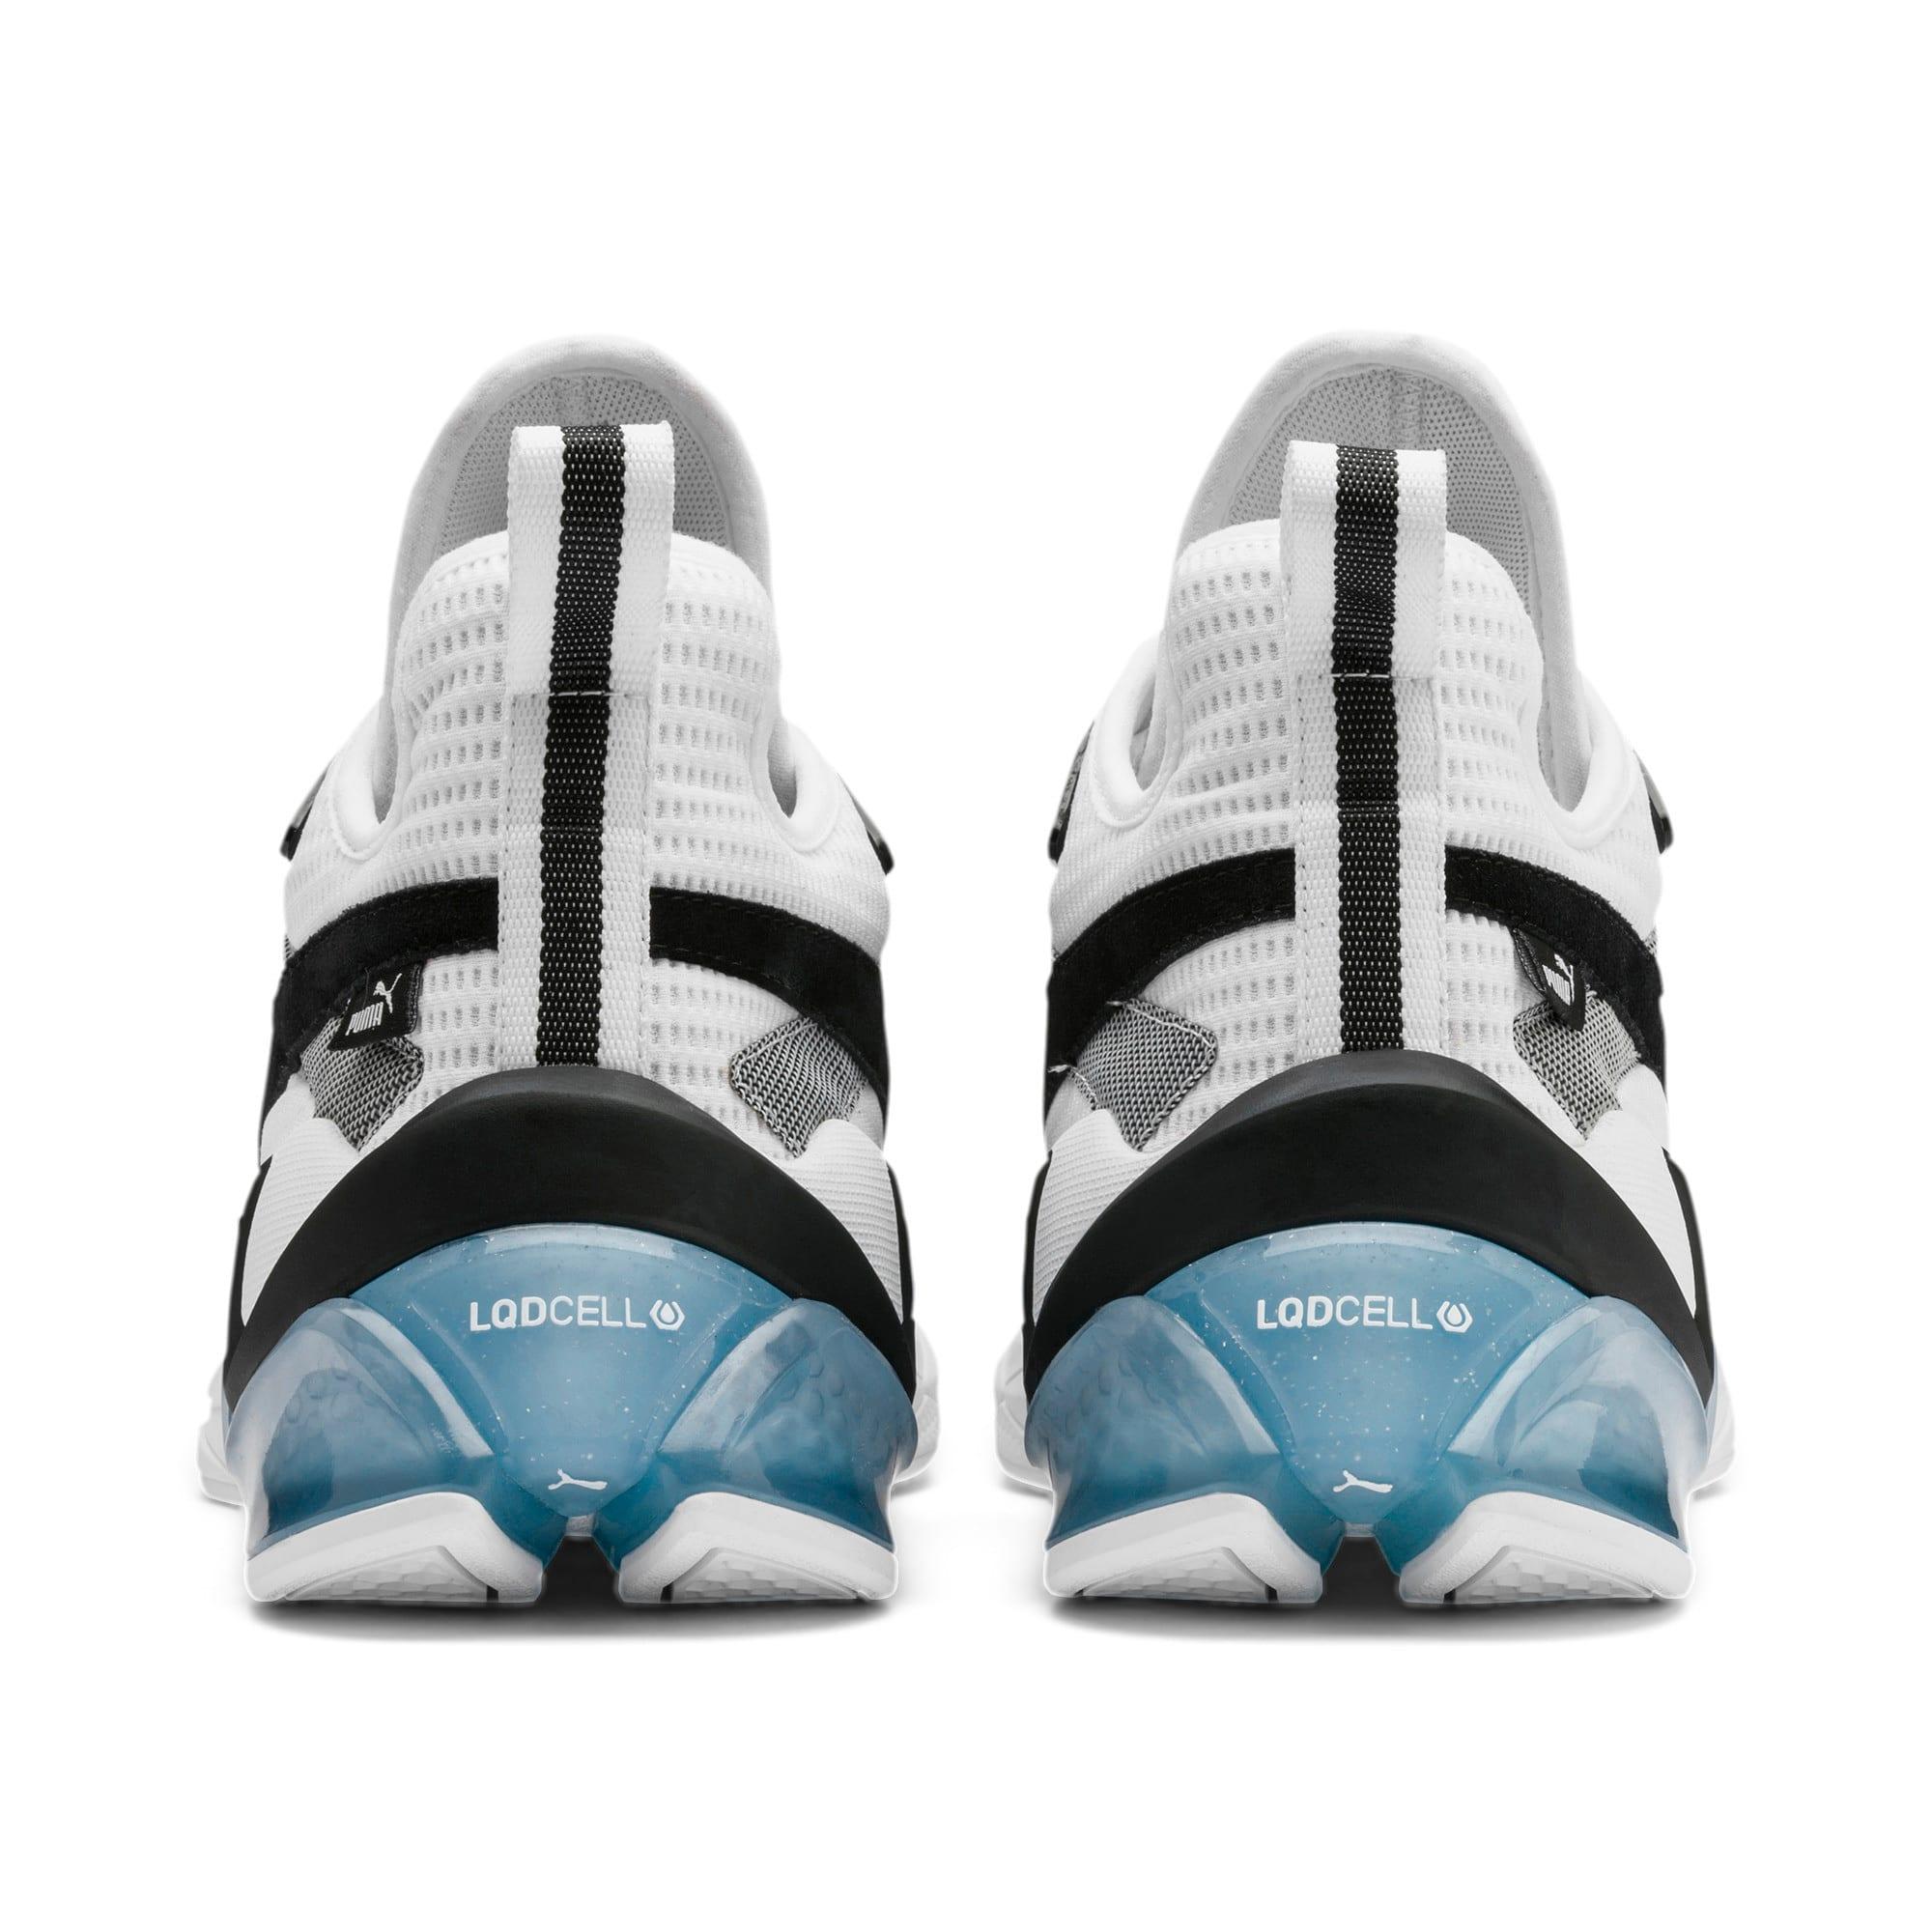 Anteprima 4 di LQDCELL Origin Men's Shoes, Puma White-Puma Black, medio